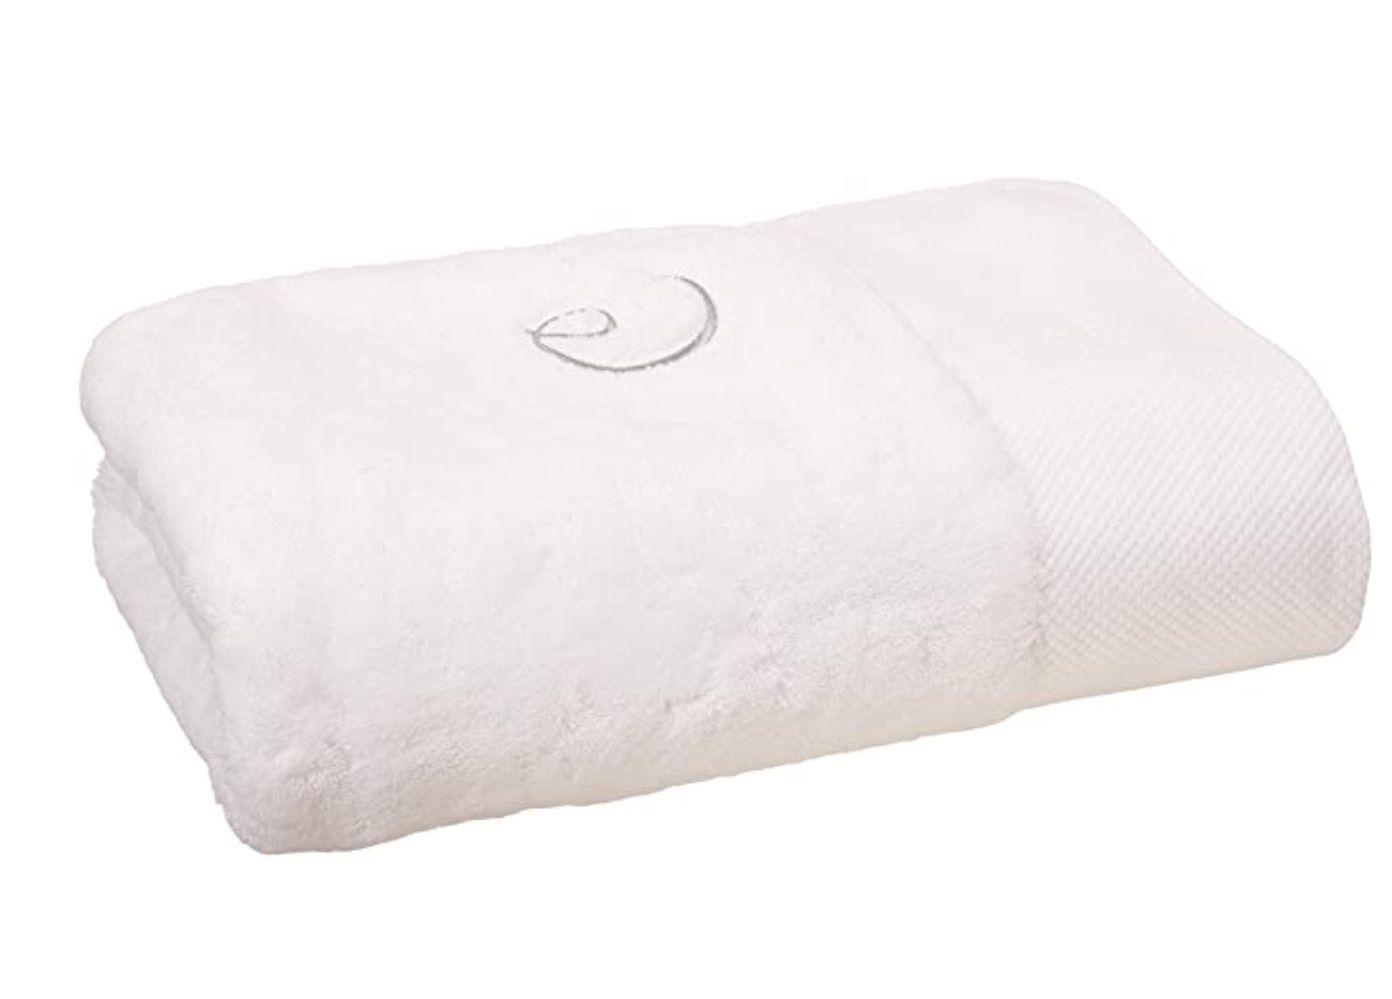 Calla Angel Superior 1000 Gram Egyptian Cotton Oversize 63 x 31 Bath Towel